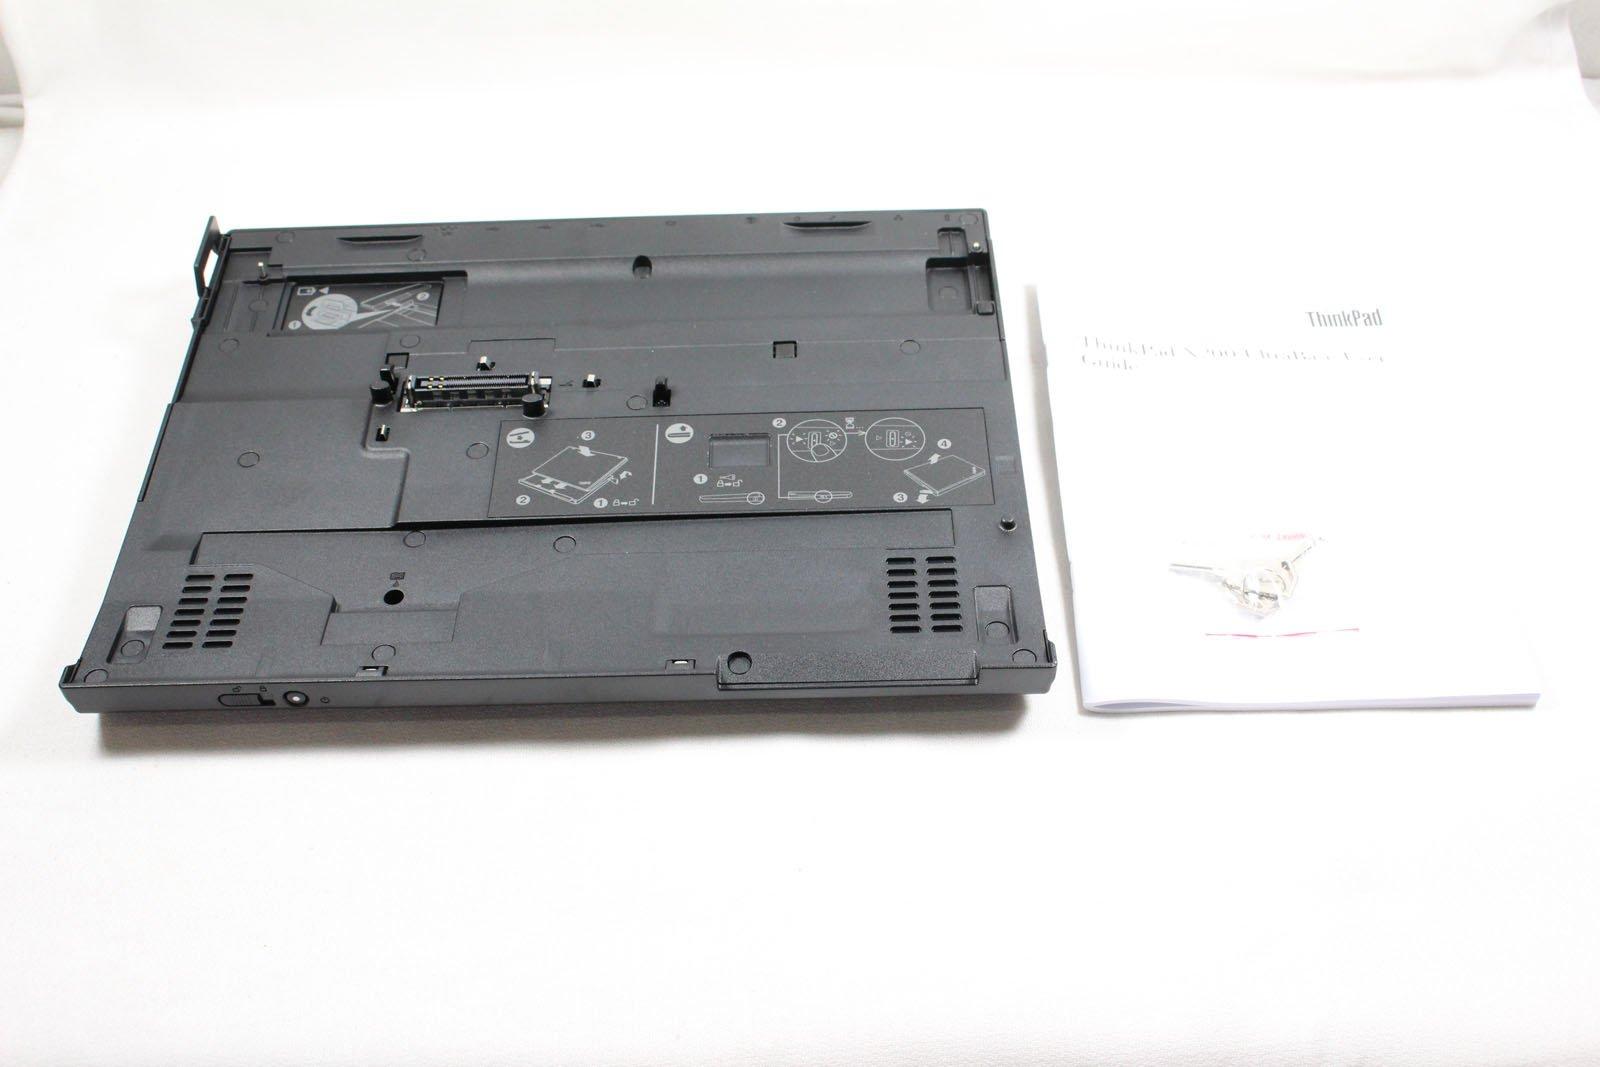 43R8781 - Lenovo ThinkPad X200 UltraBase Docking station Network, USB, Display/Video, VGA, Microphone, Headphone, Stereo, Docking/Port Replicator by Lenovo Group Limited (Image #1)